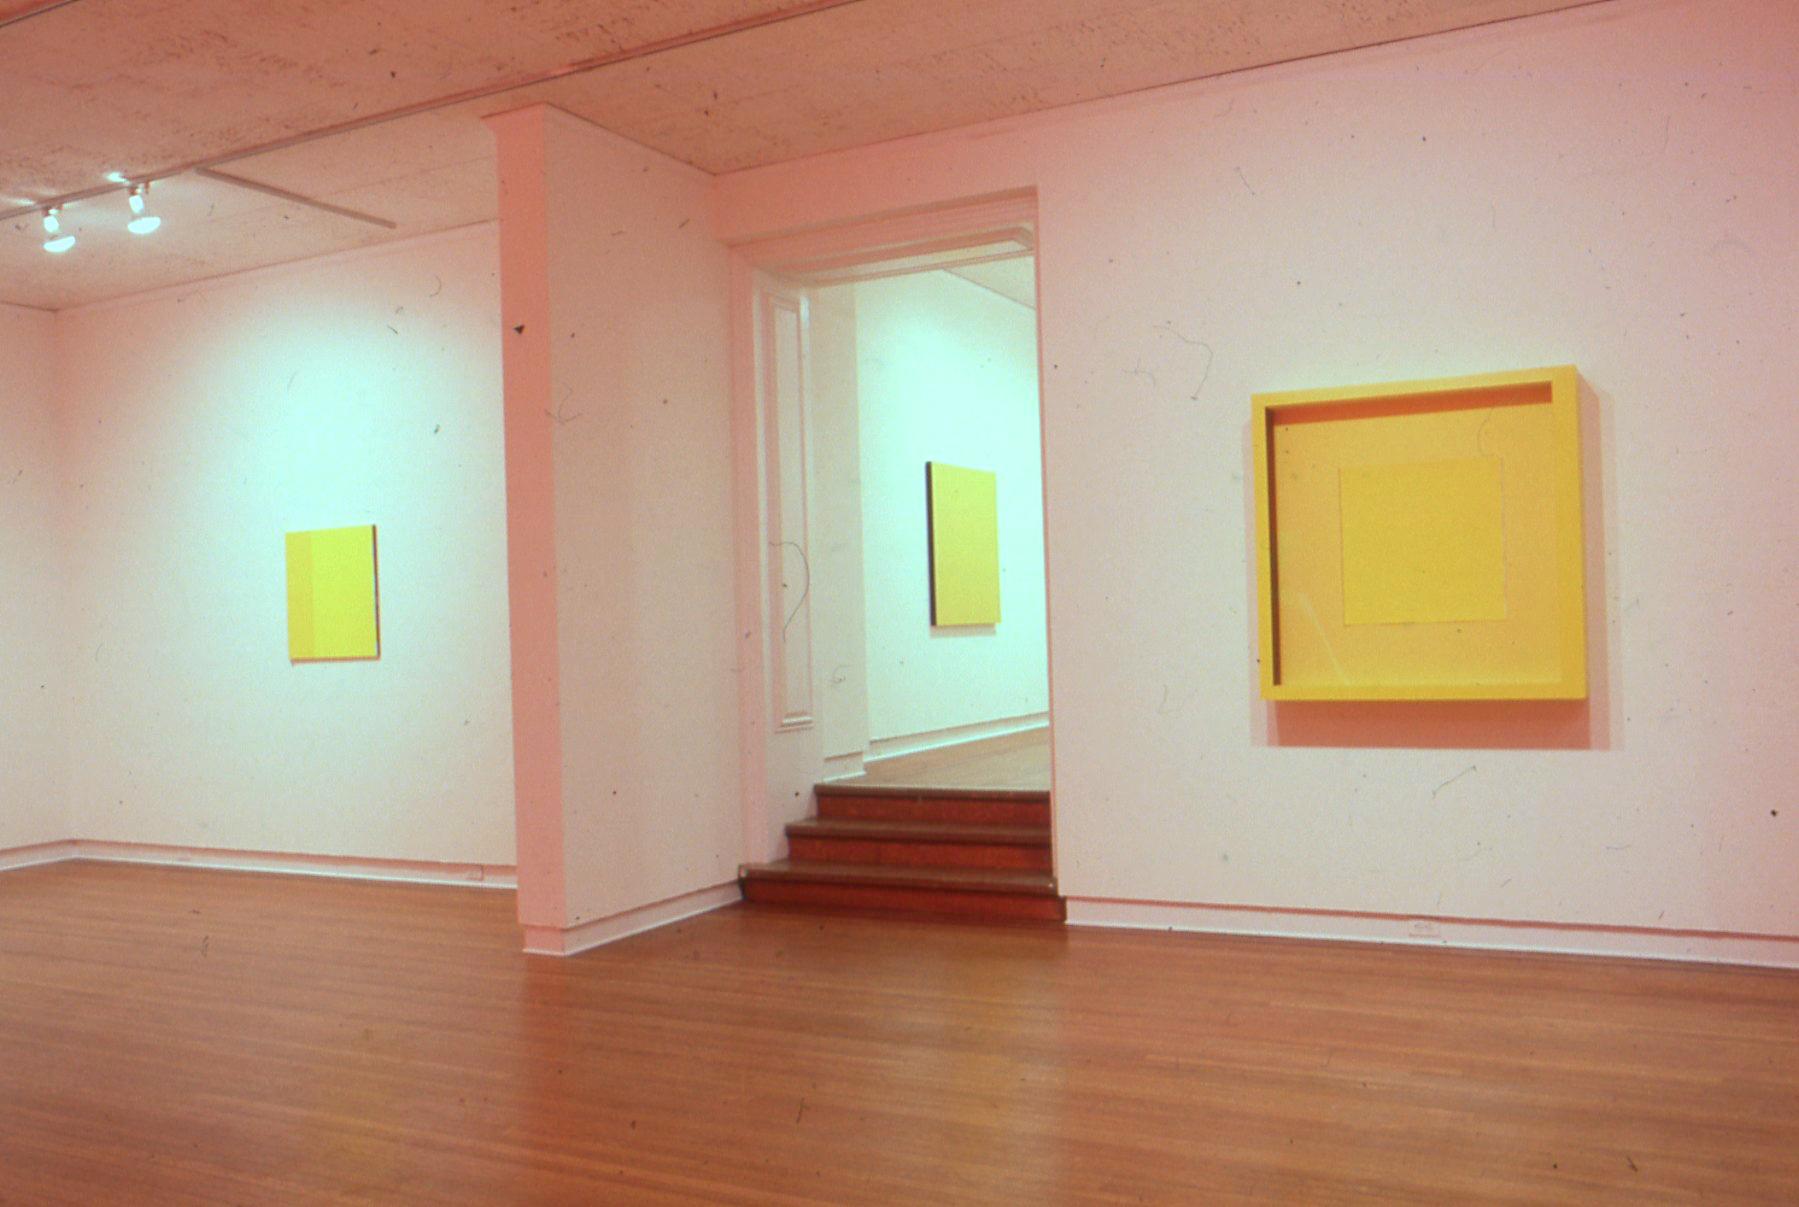 JGR. 1988. Borgenicht Gallery2.jpg